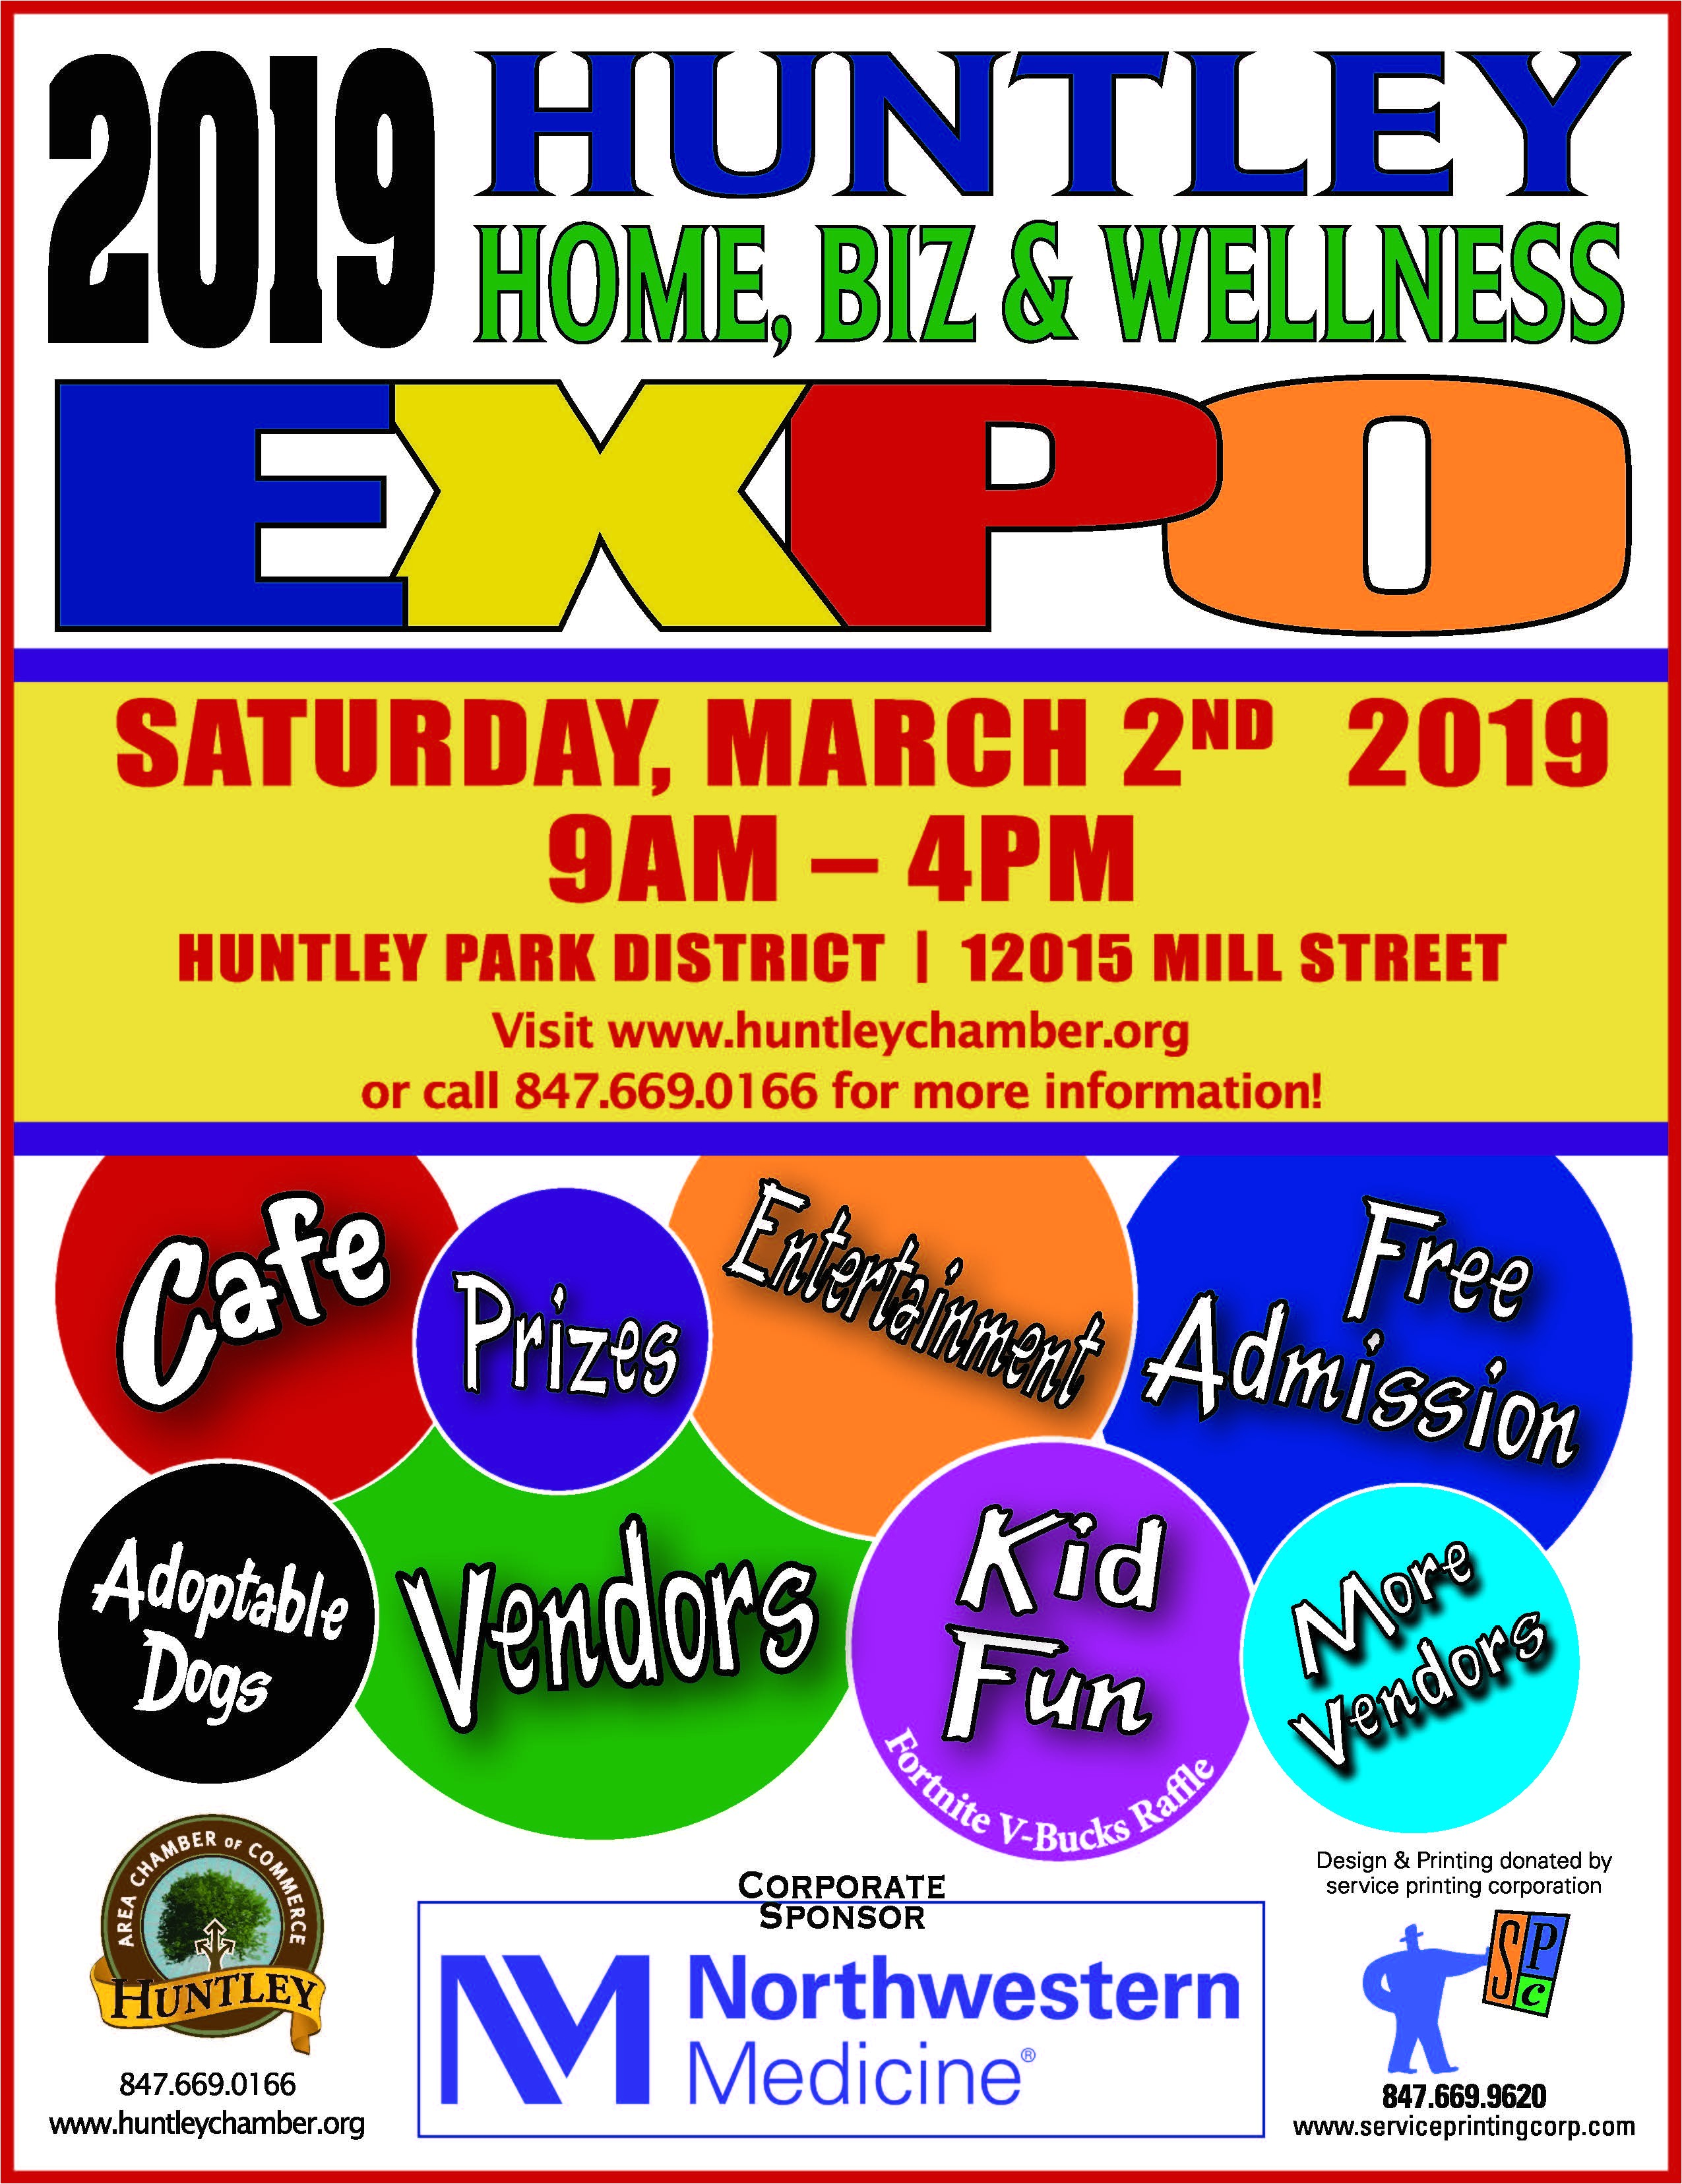 Unilock Price List 2019 2019 Home Biz Wellness Expo Oct 12 2018 to Mar 2 2019